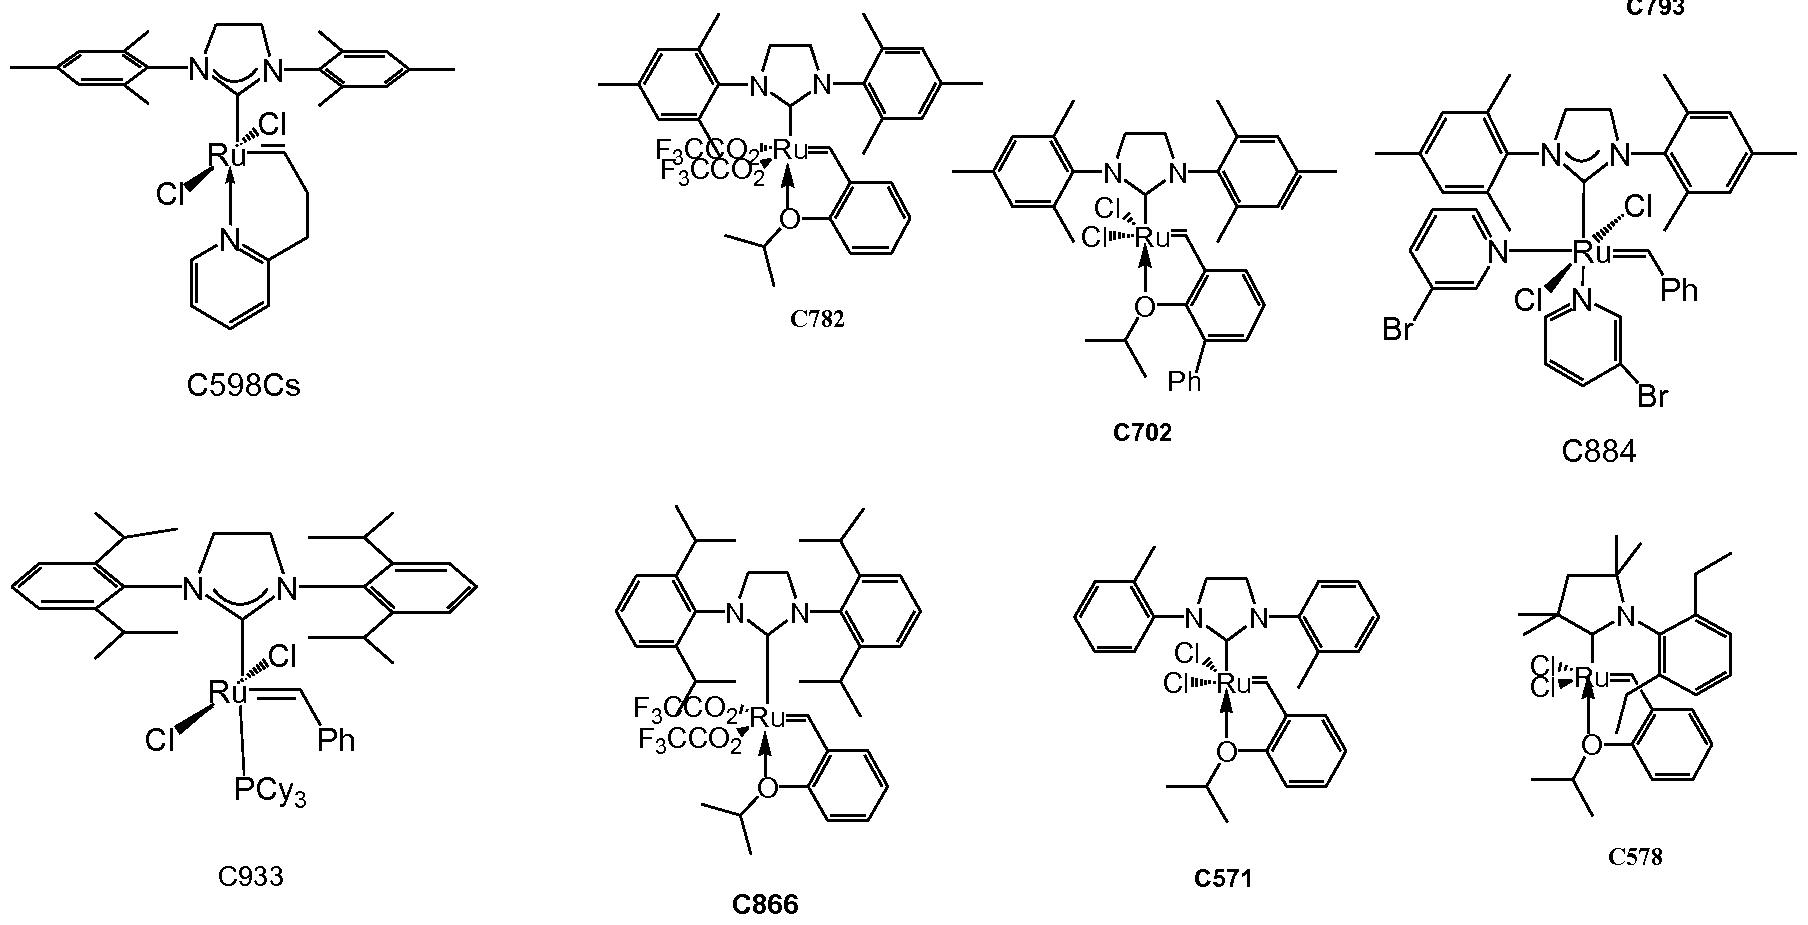 Kerosene Chemical Structure